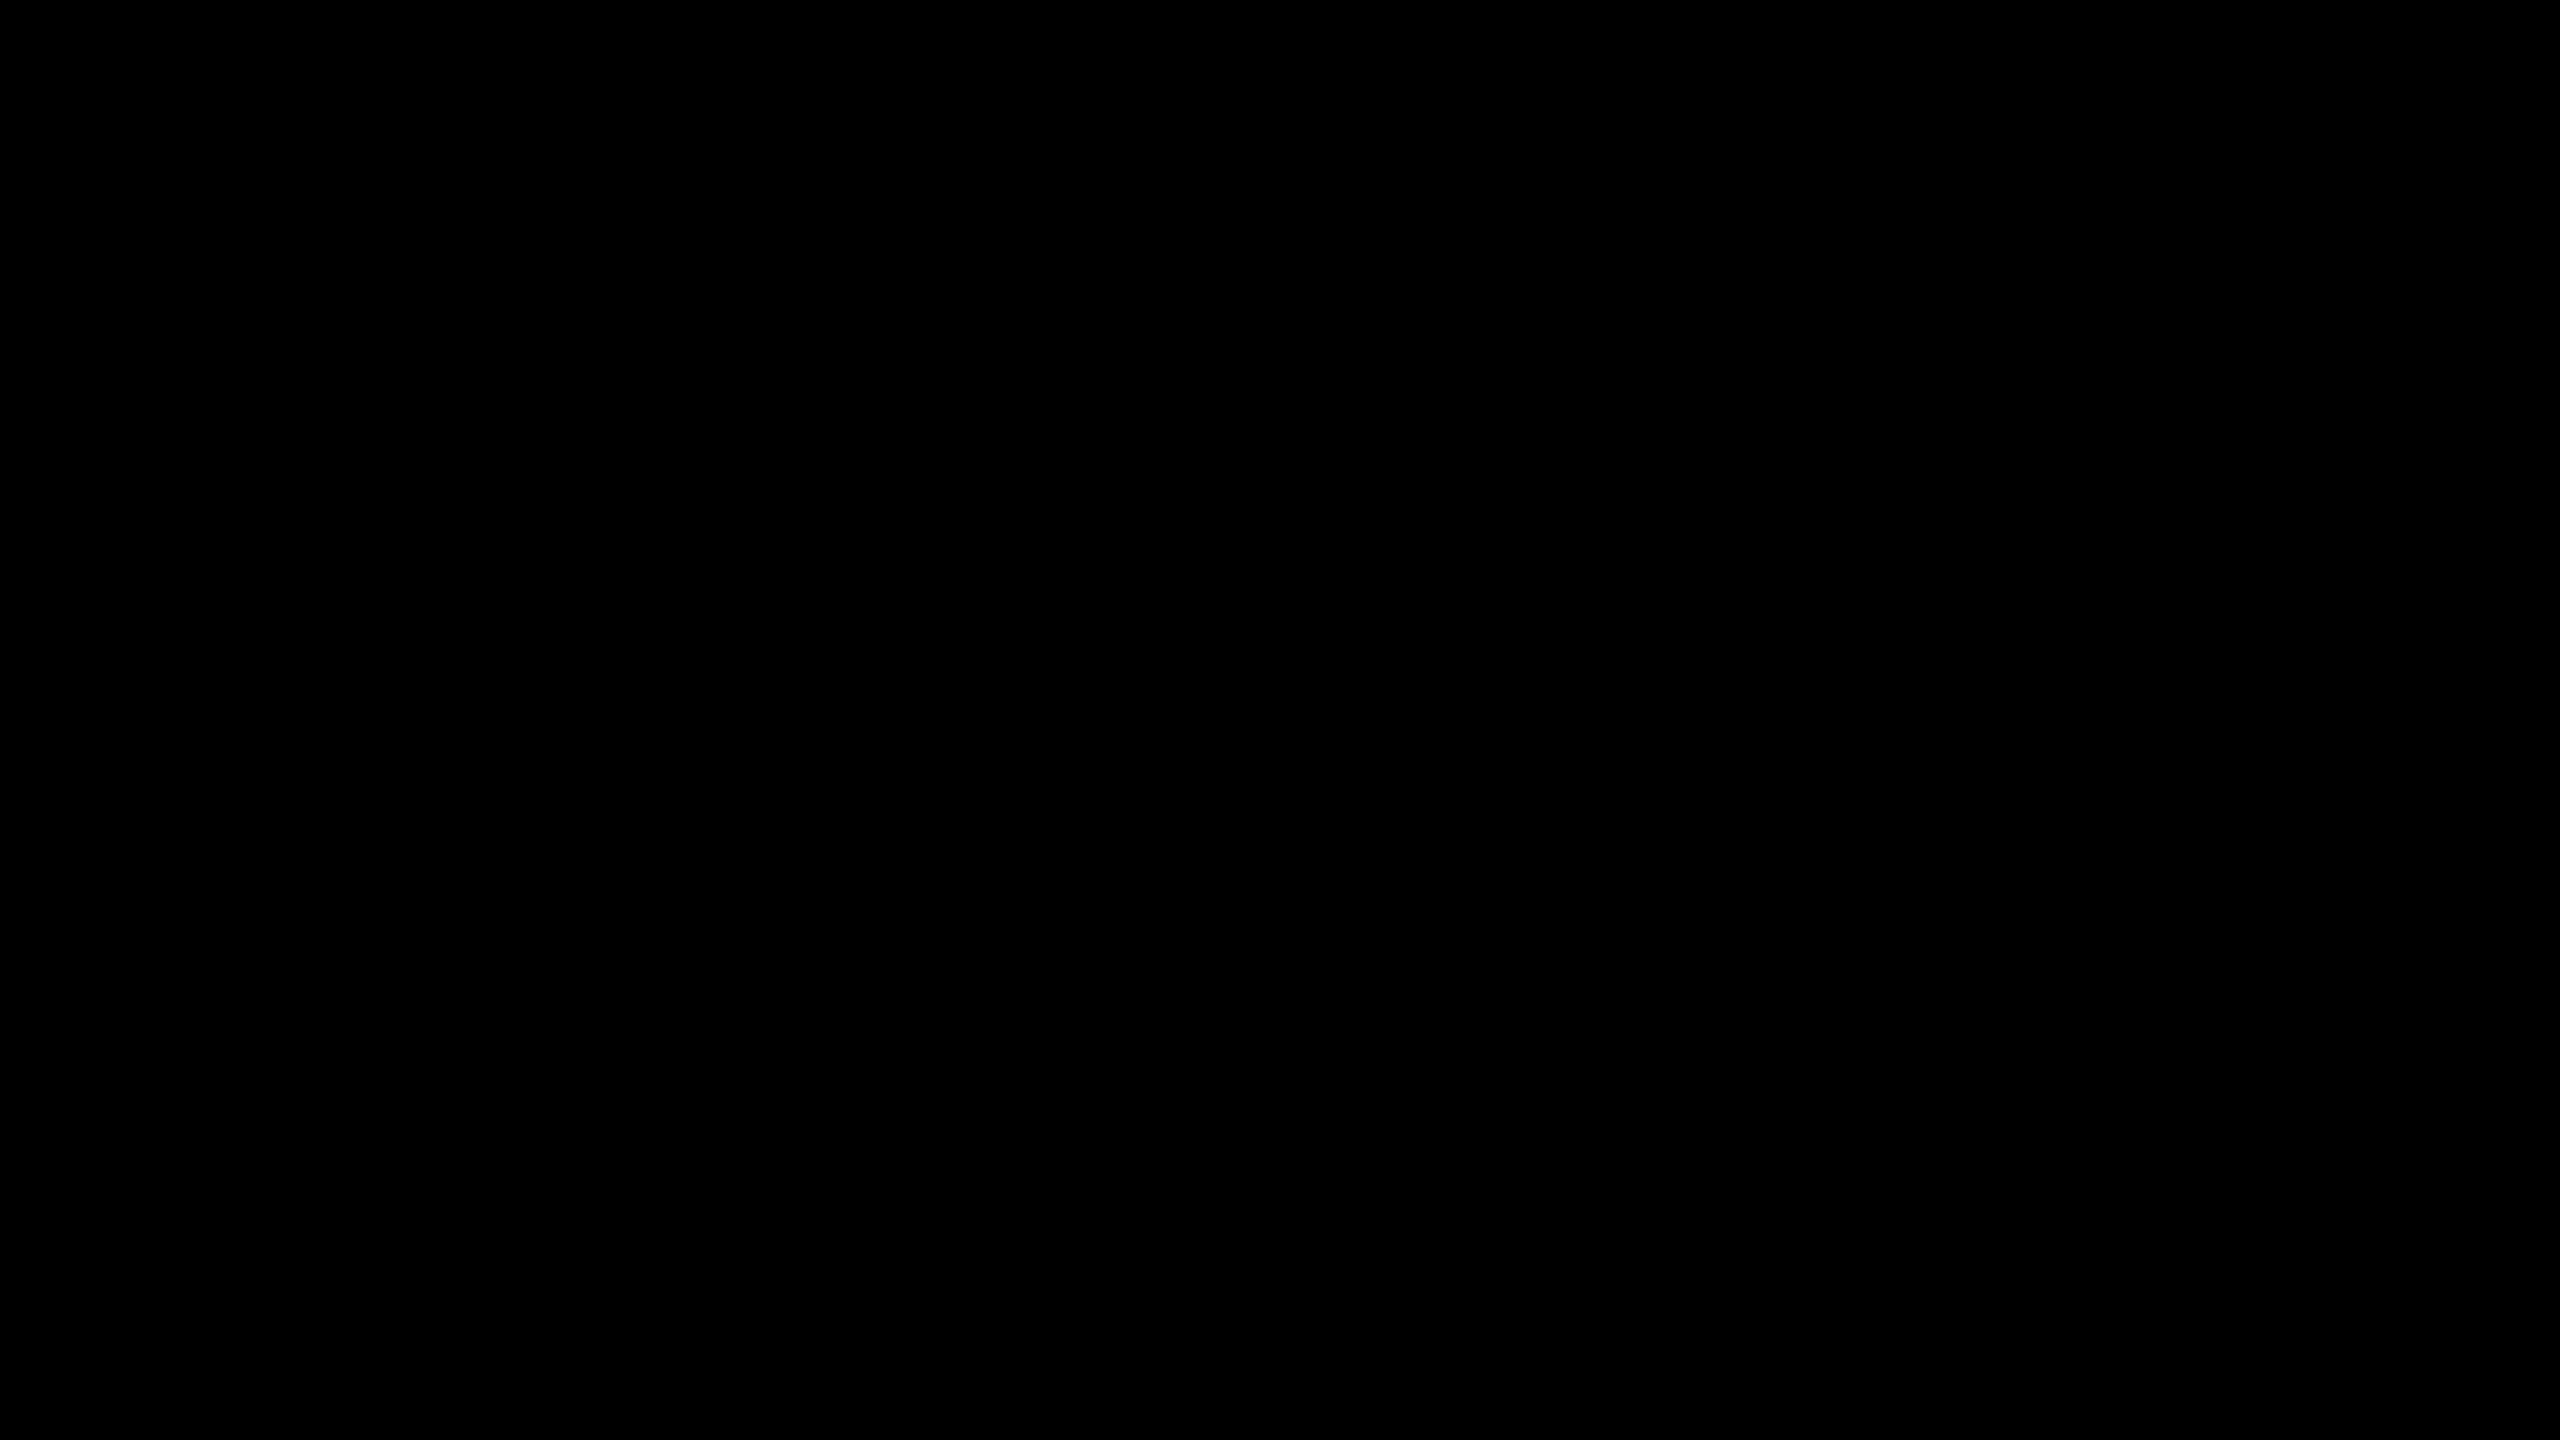 2560x1440-black-solid-color-background